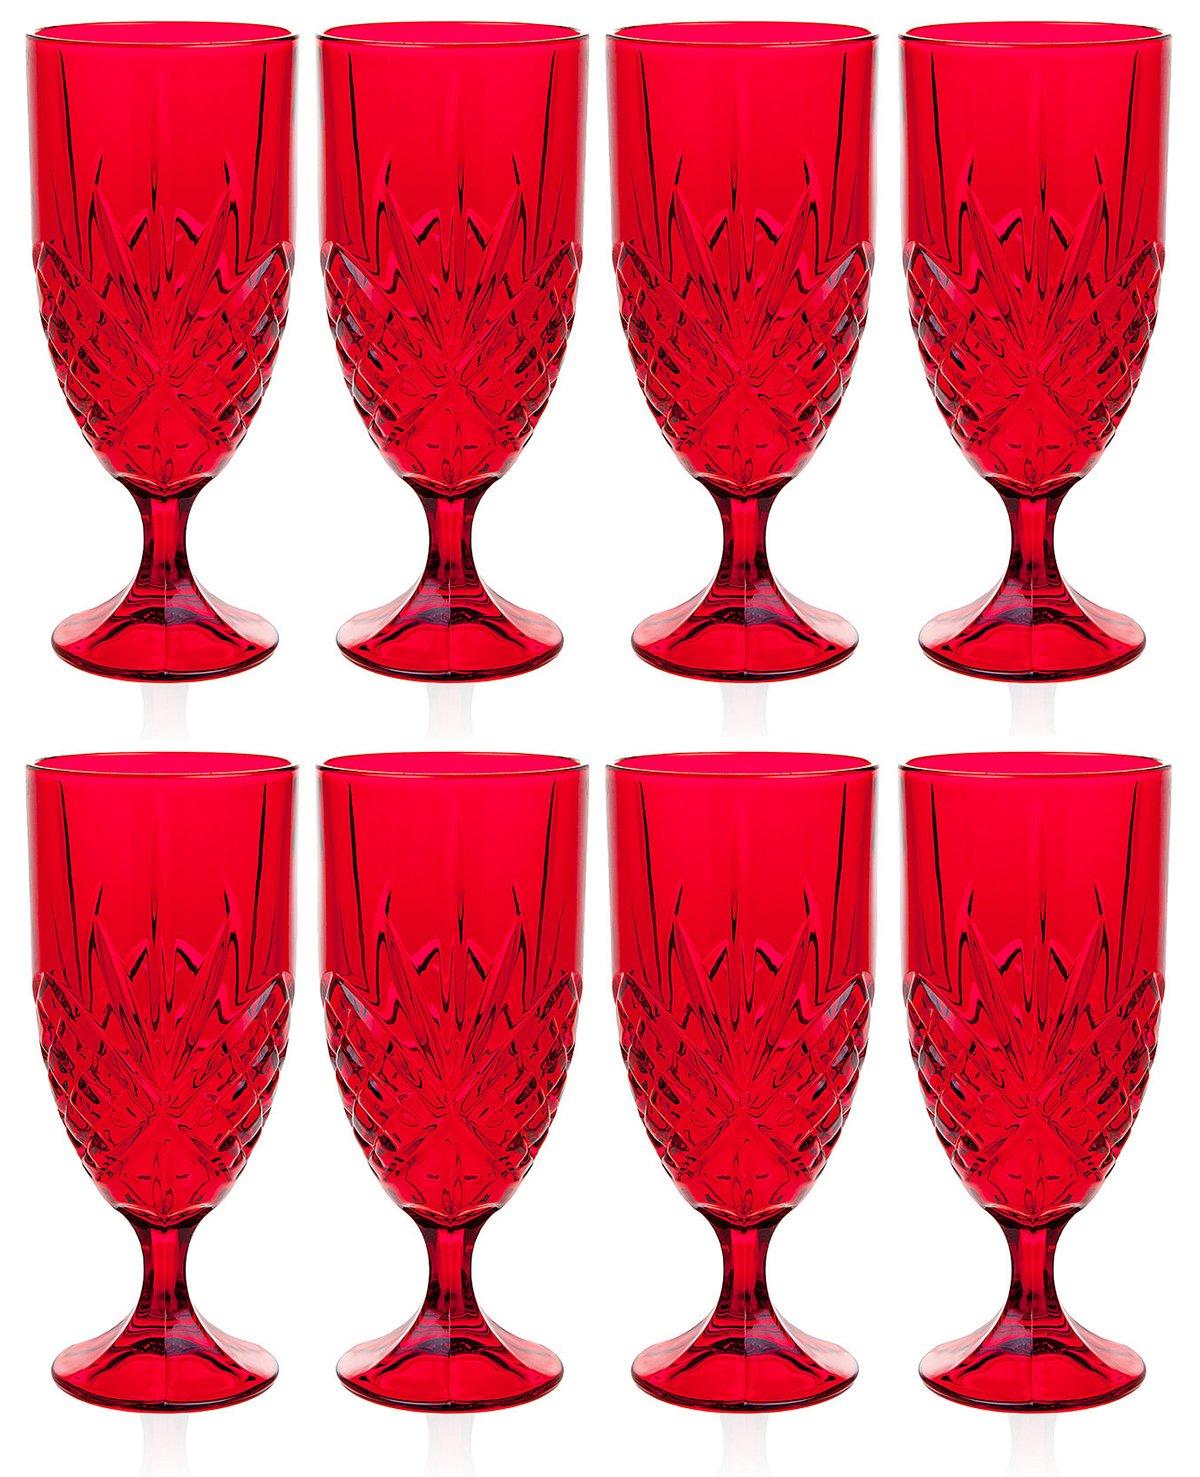 Godinger Dublin Red Crystal Iced Beverage Glasses, Set of 8 (Eight), Ruby Red